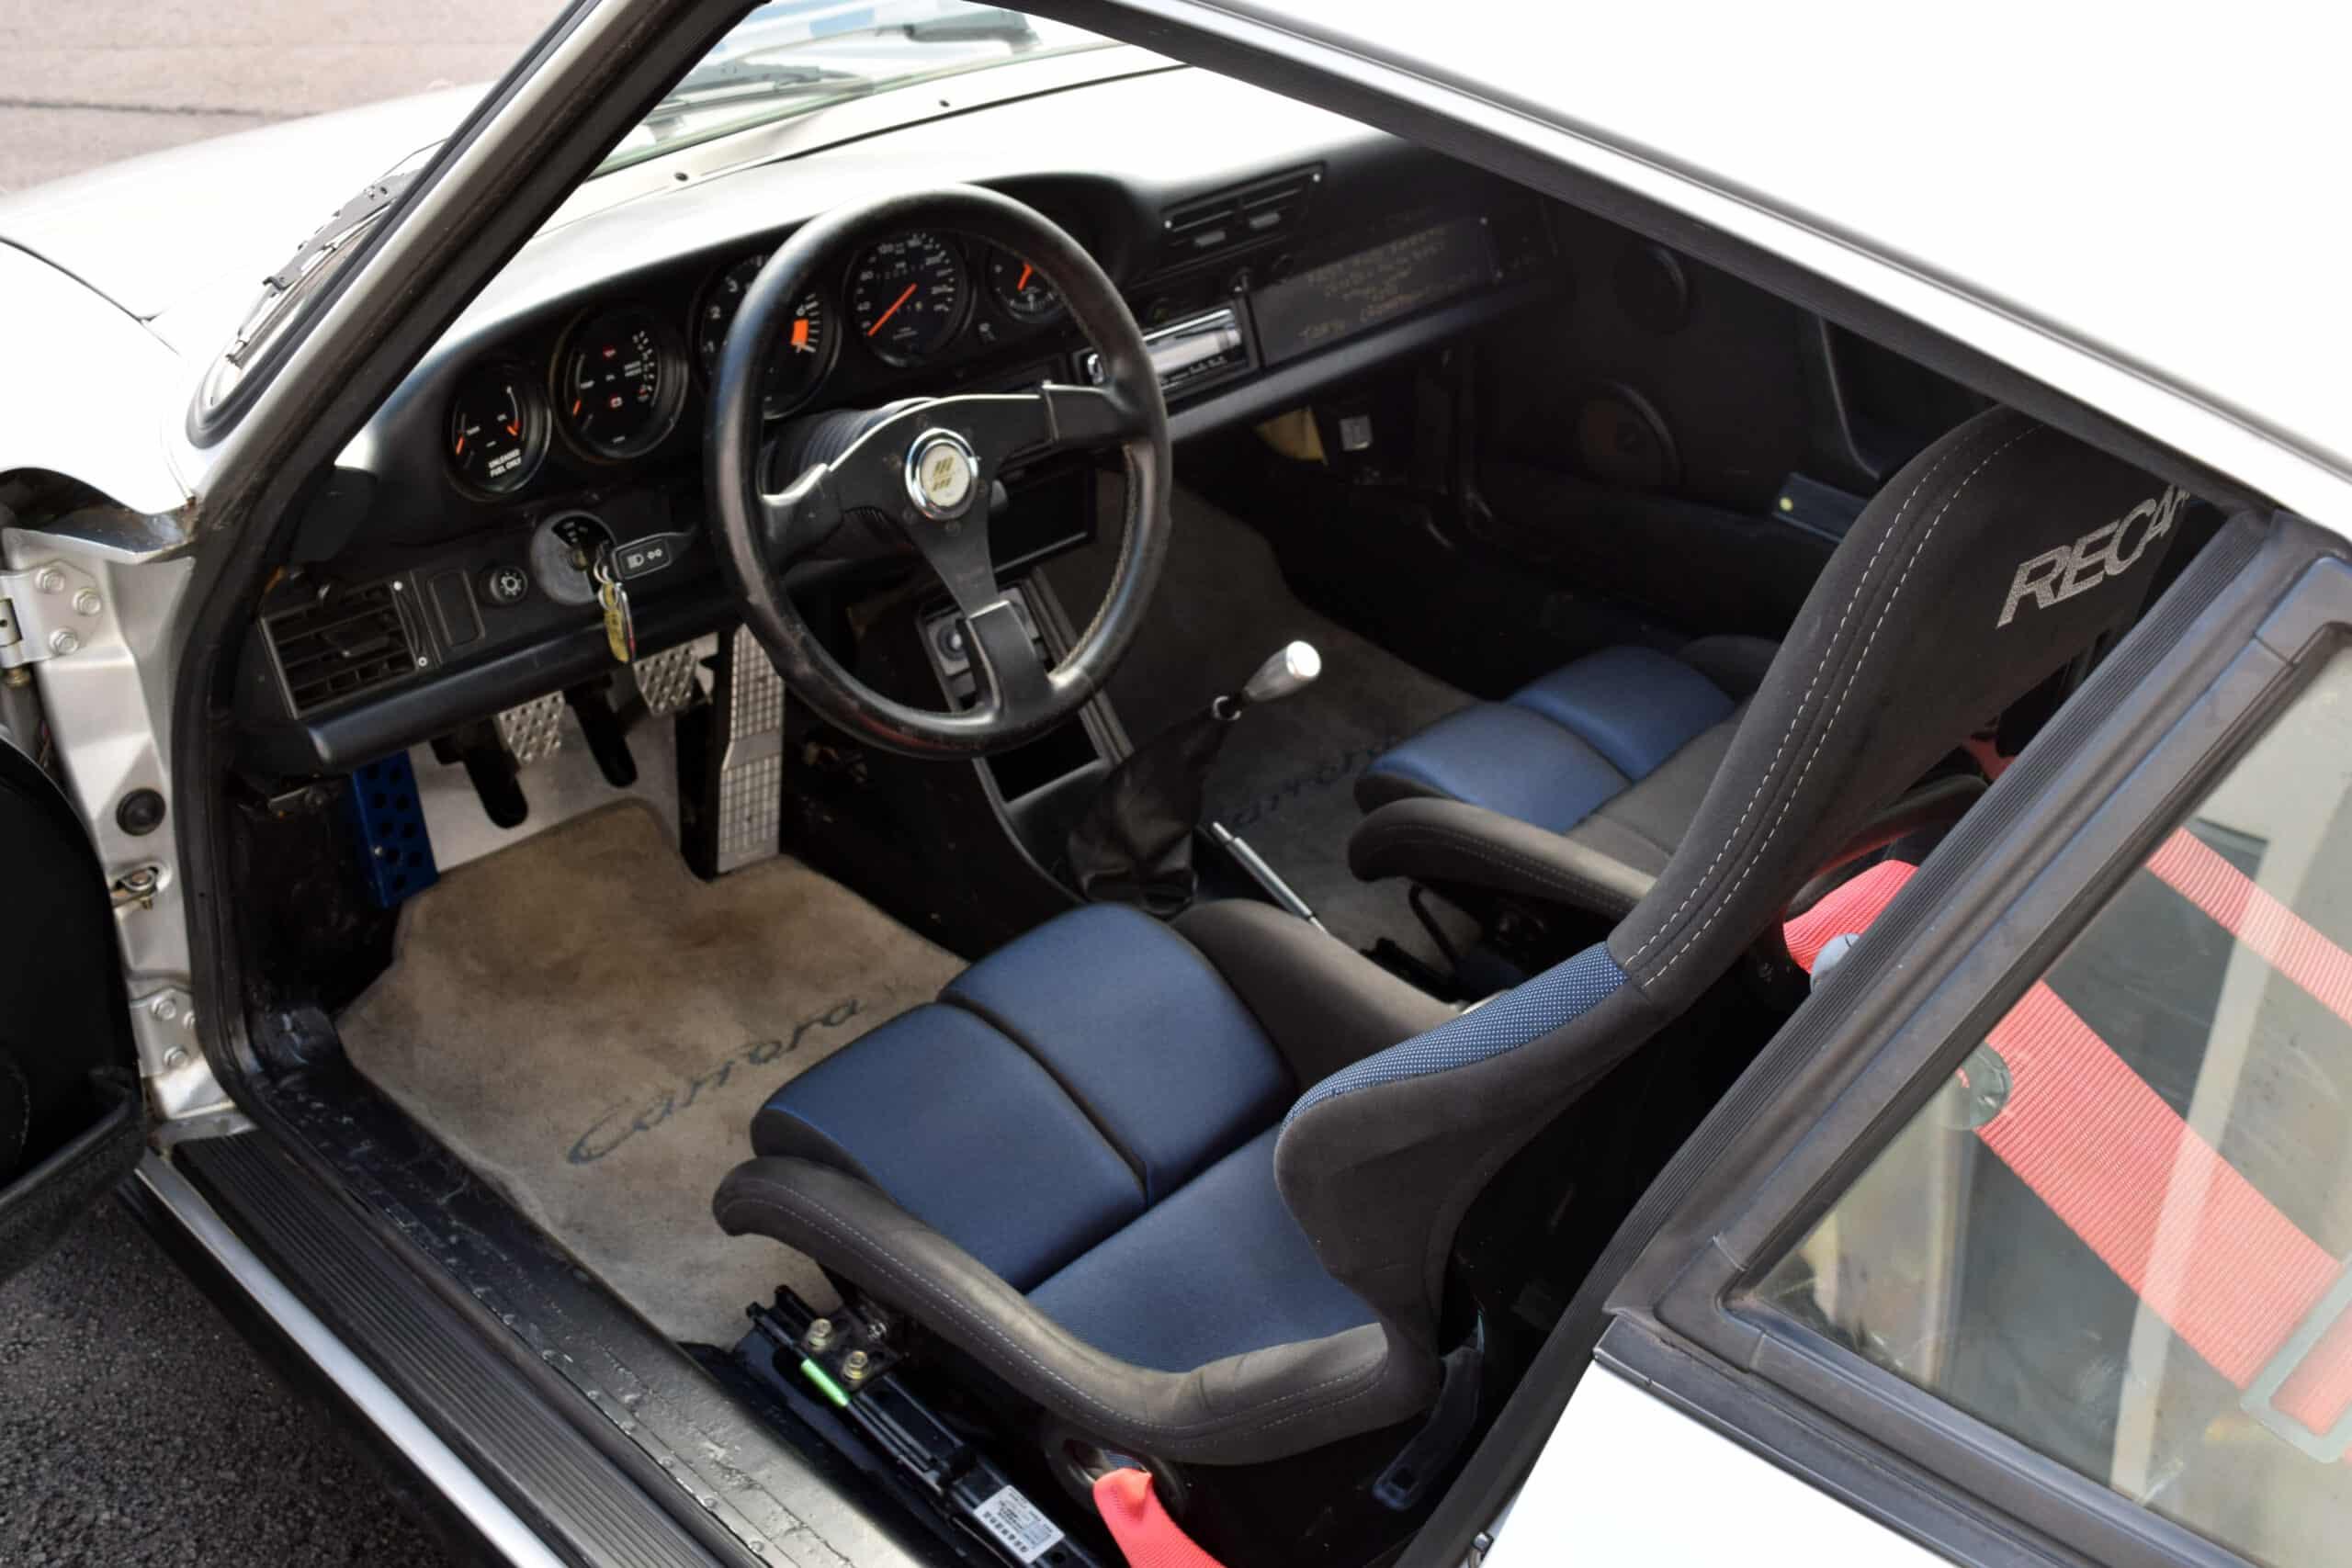 1988 Carrera G50 Lightweight Outlaw,Recaro Seats, Watanabe Wheels, Tarett Engineering Swaybars, Bilstein Suspension